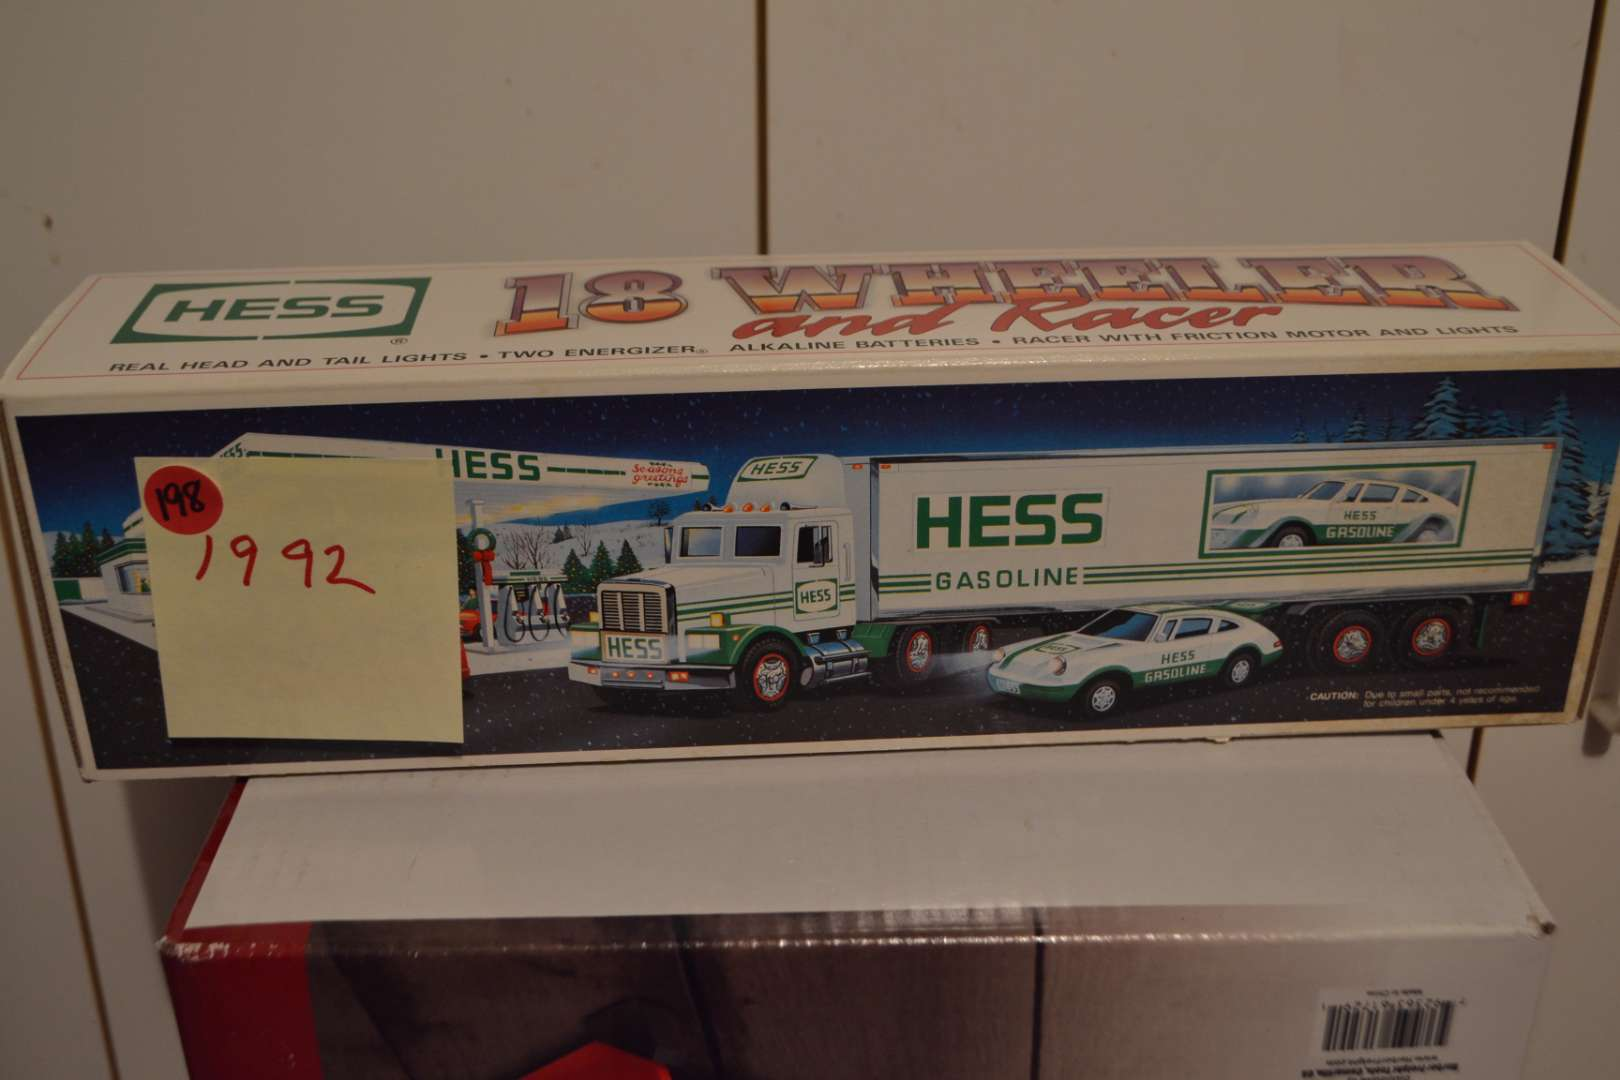 Lot # 198 HESS TRUCK 1992